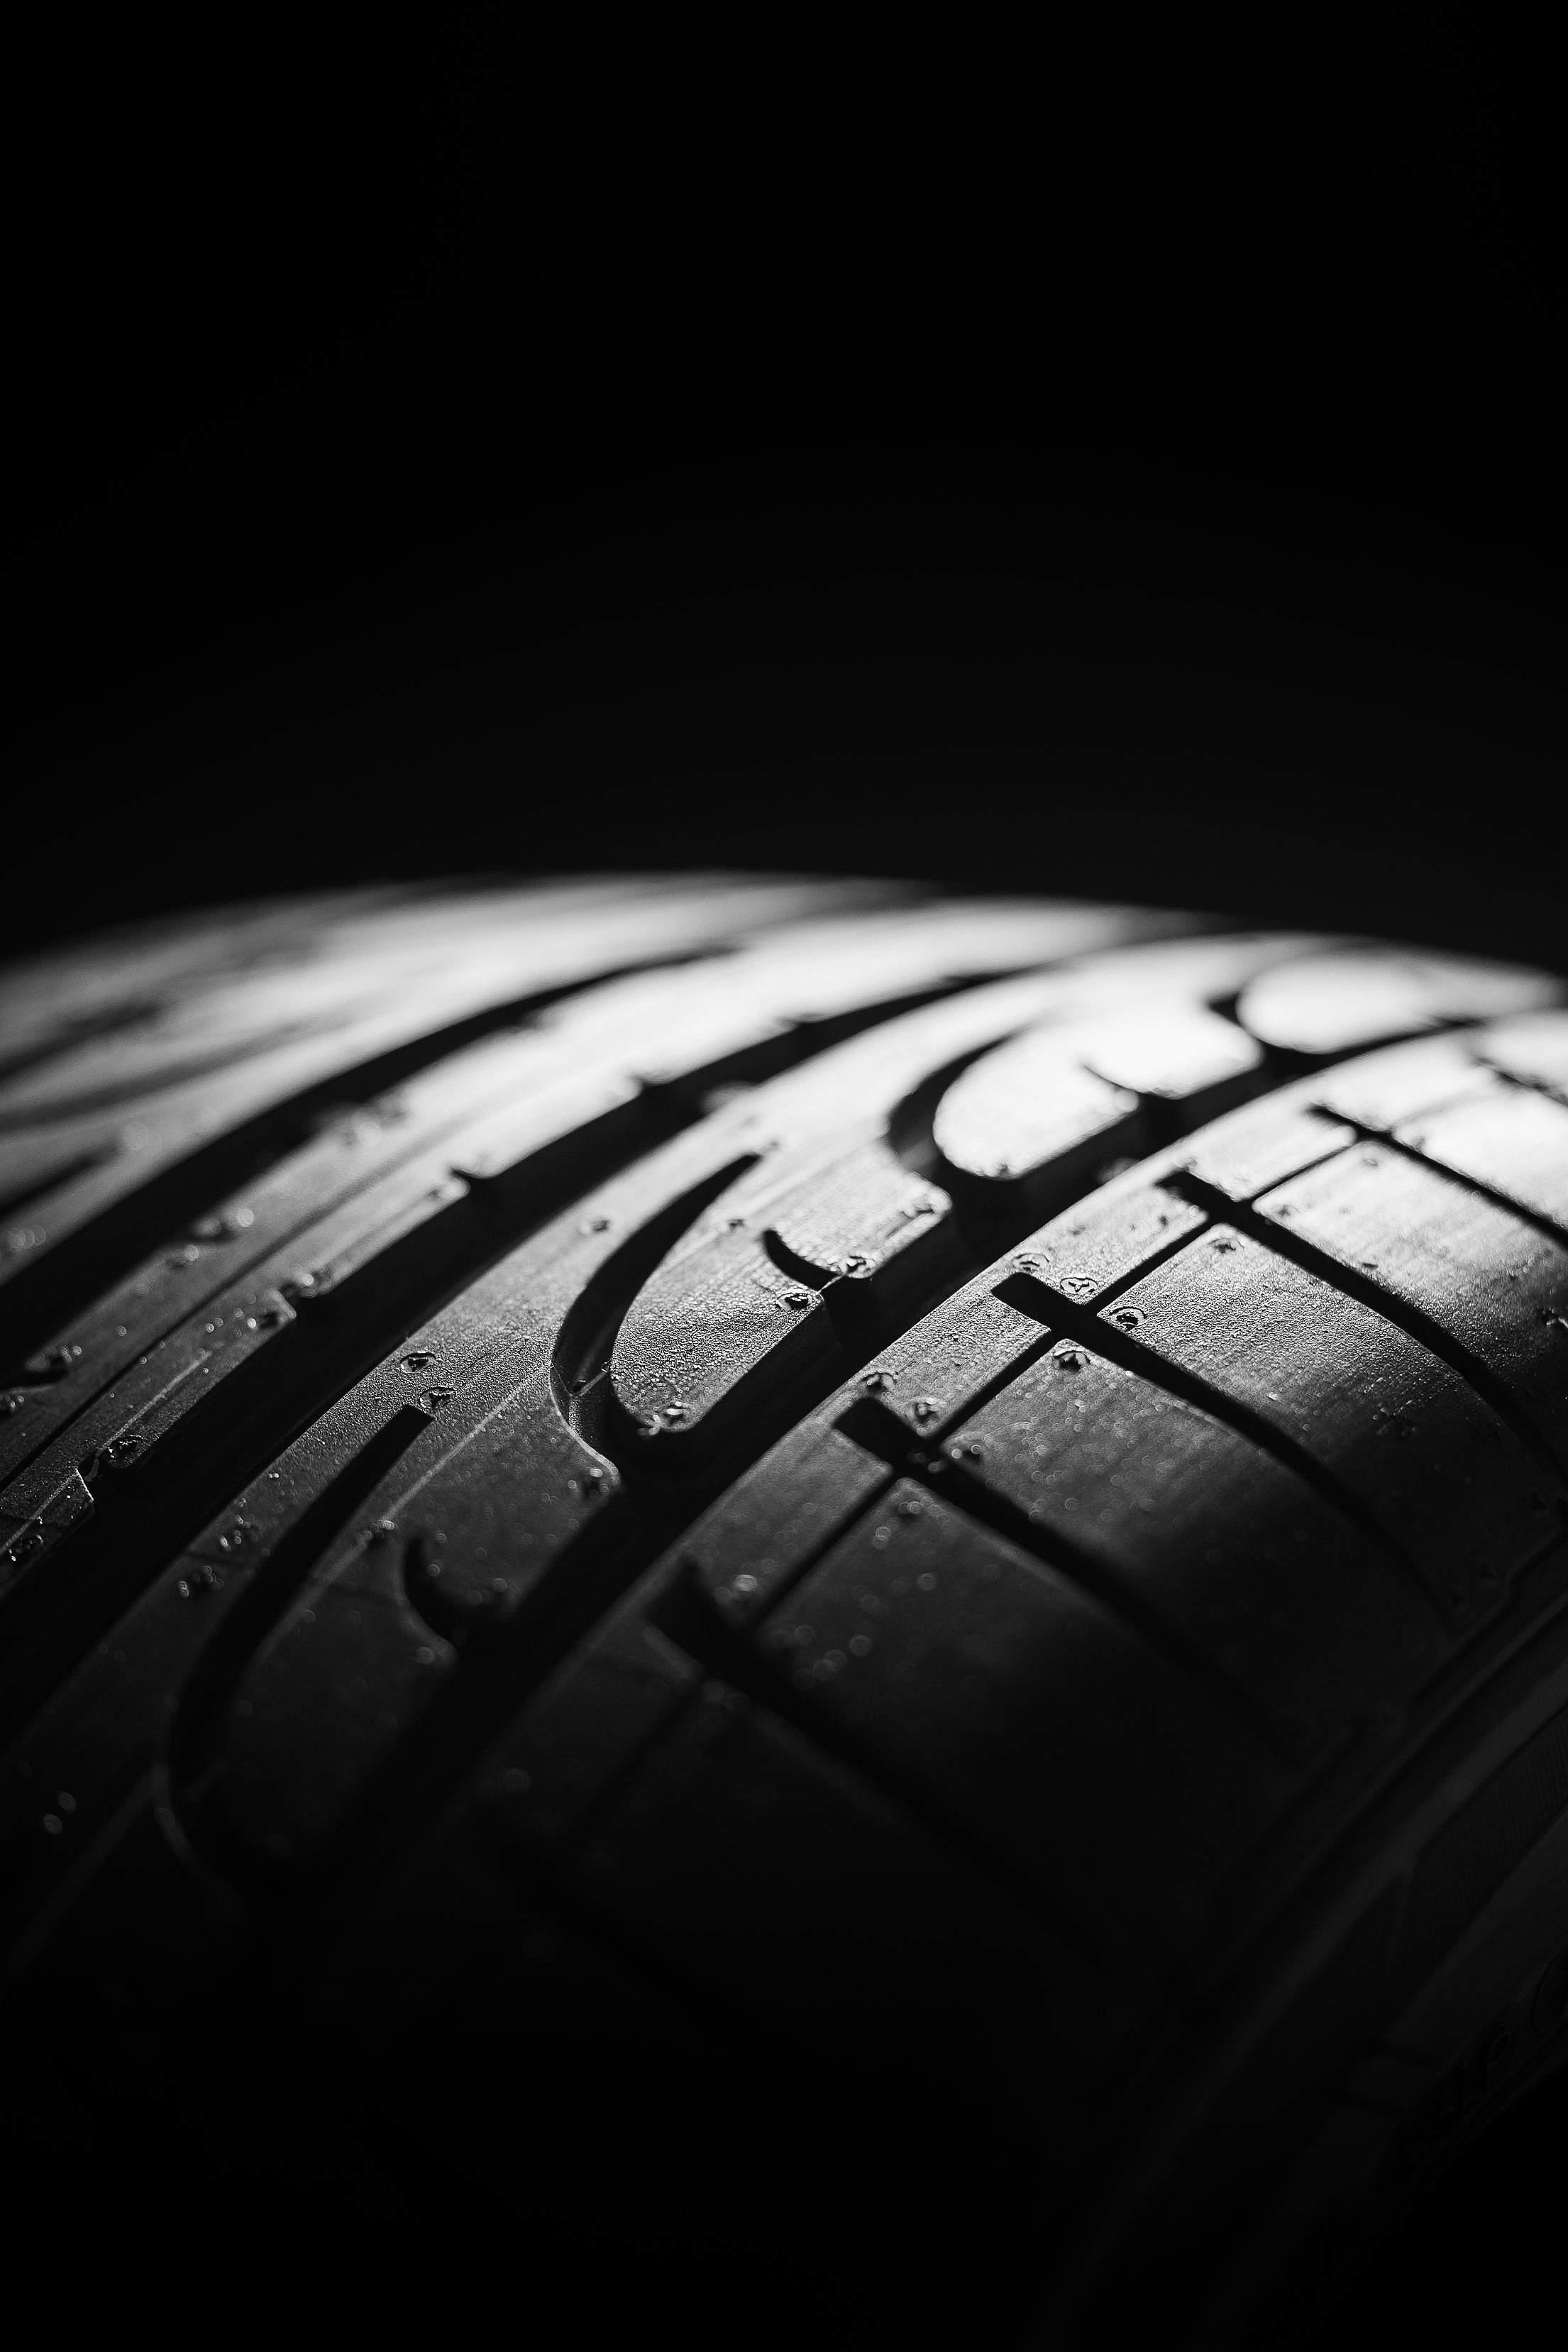 Tire Free Stock Photo